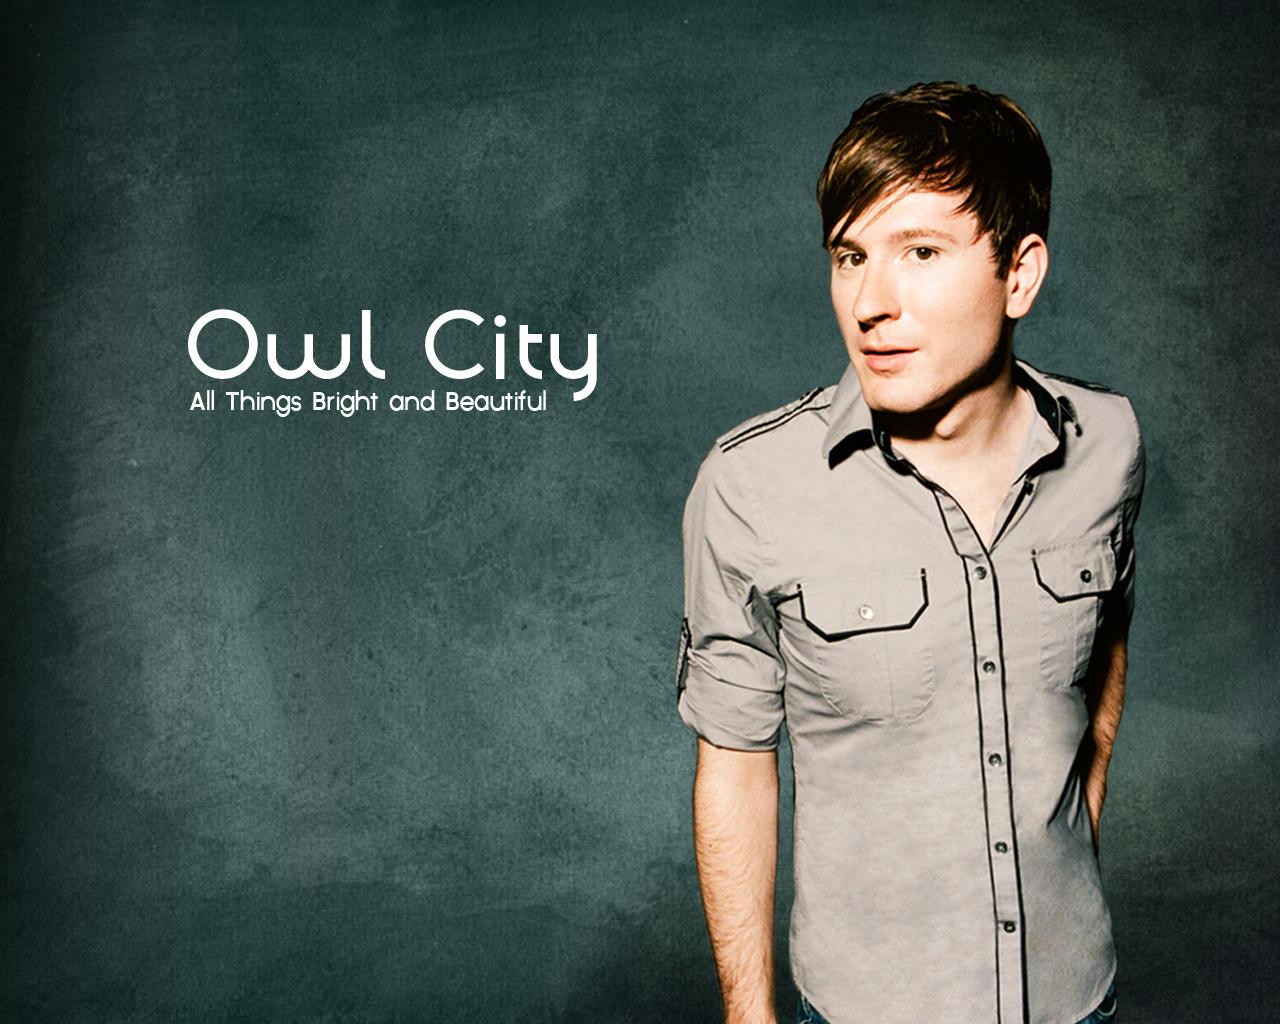 O Owl City Profil Owl City ~ KUBE...